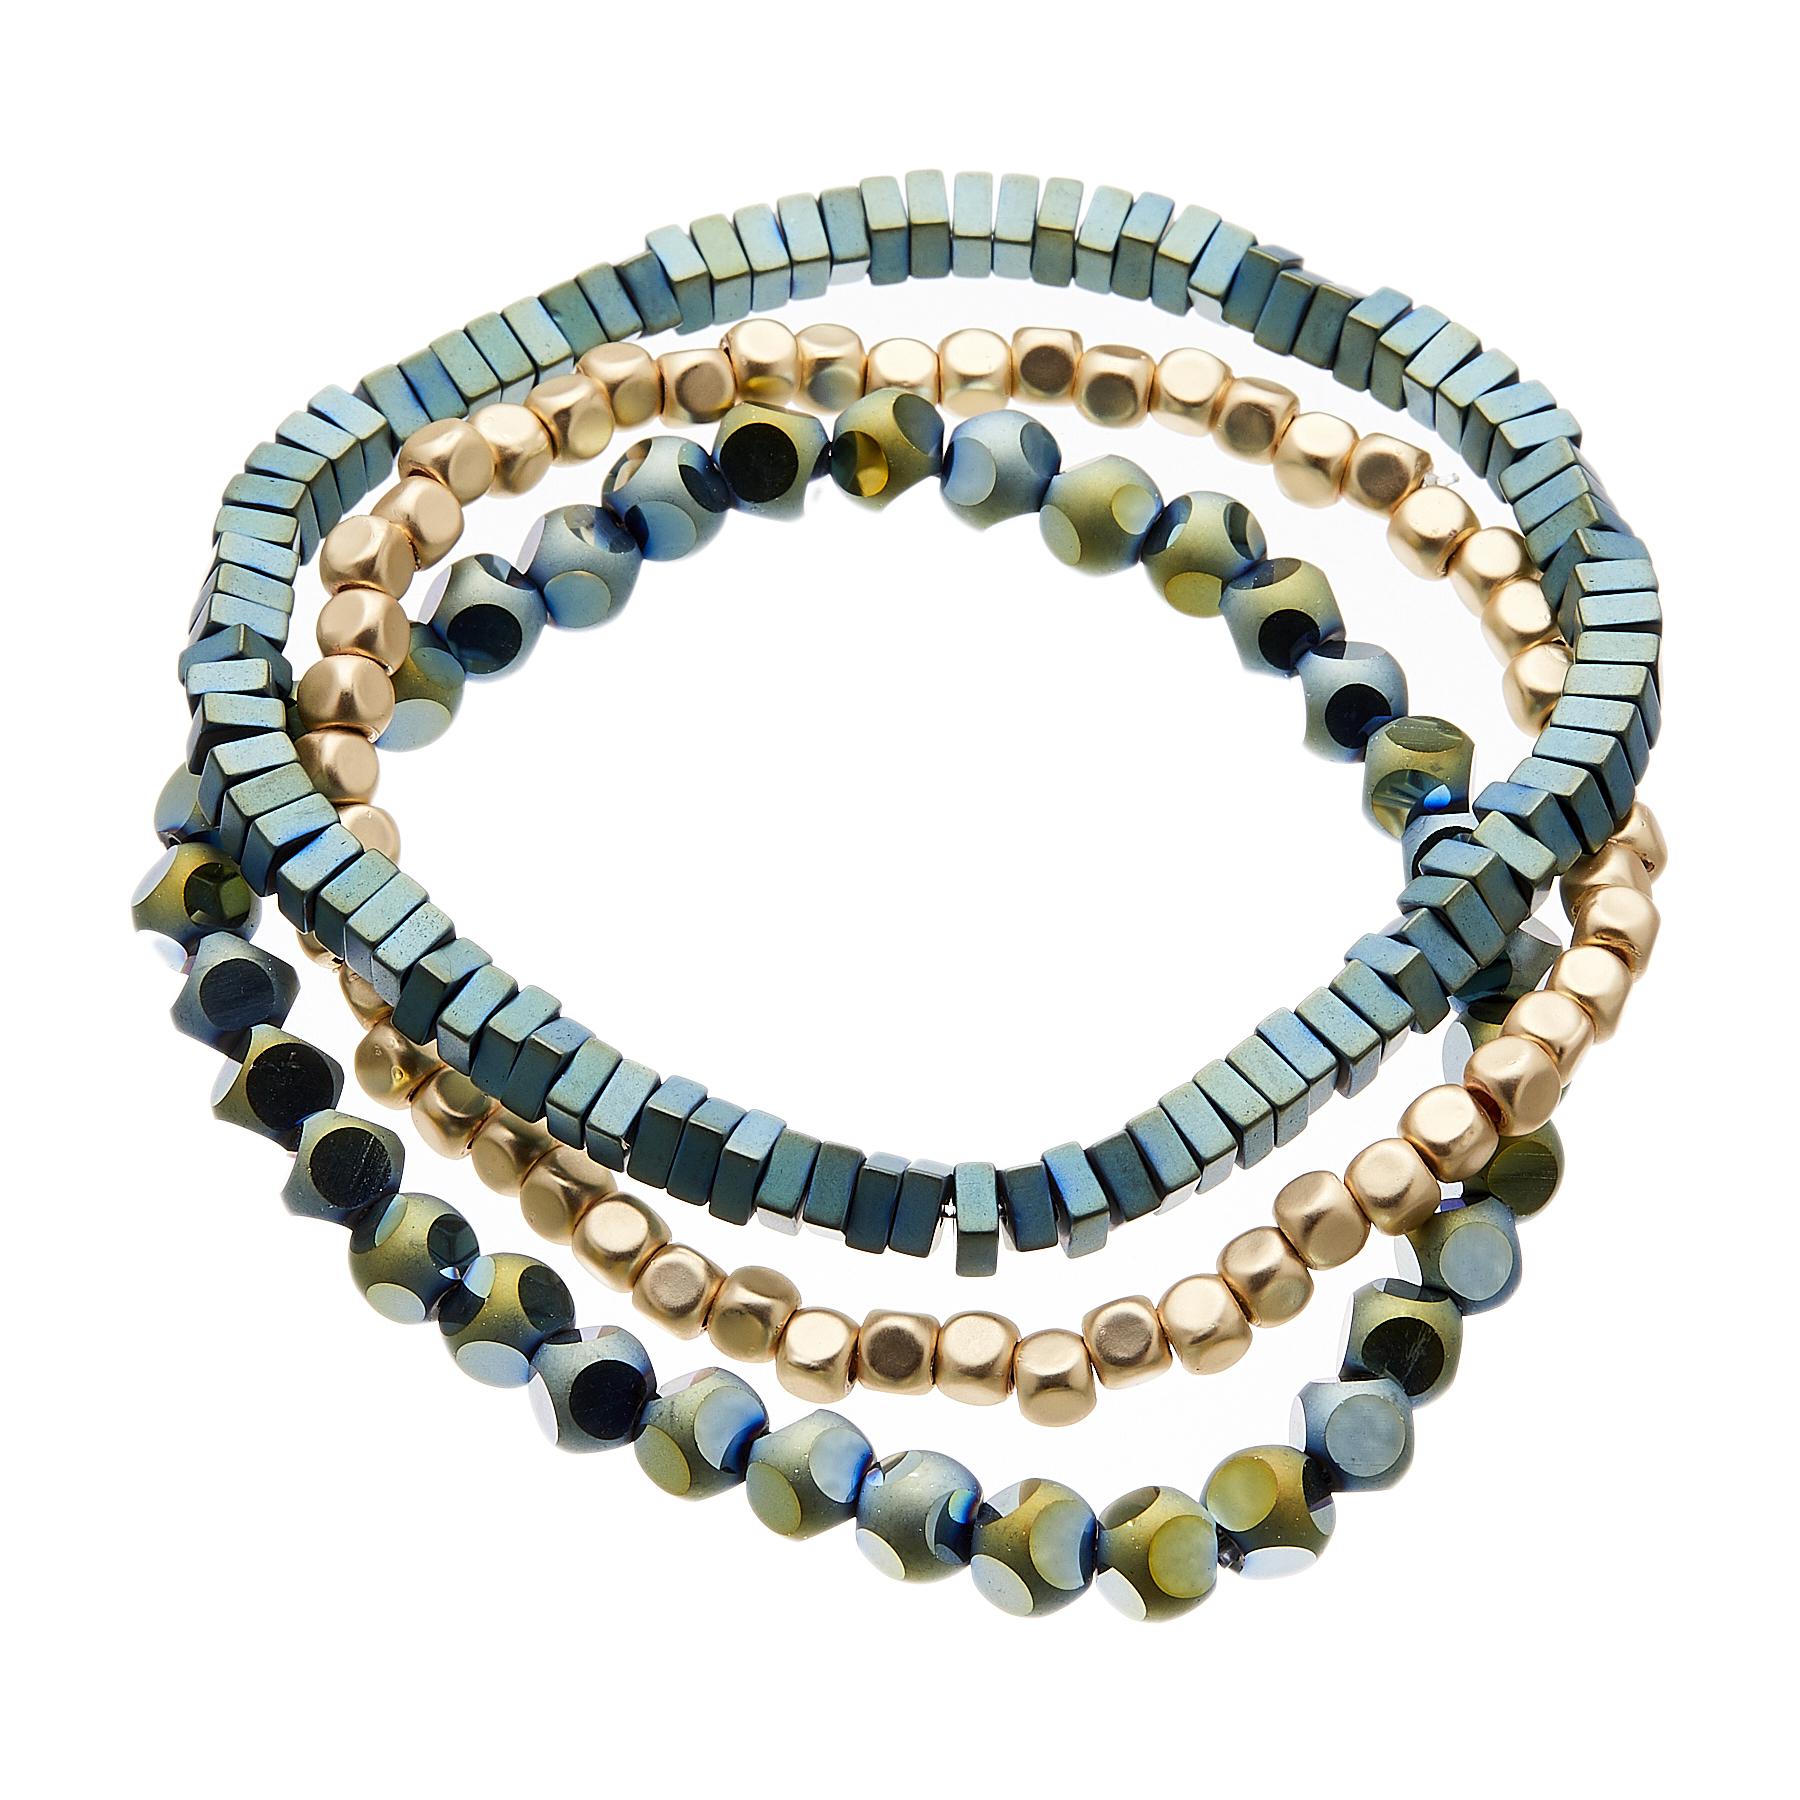 Set of three Bracelets with blue and matt gold beads - Yori B27-19-23